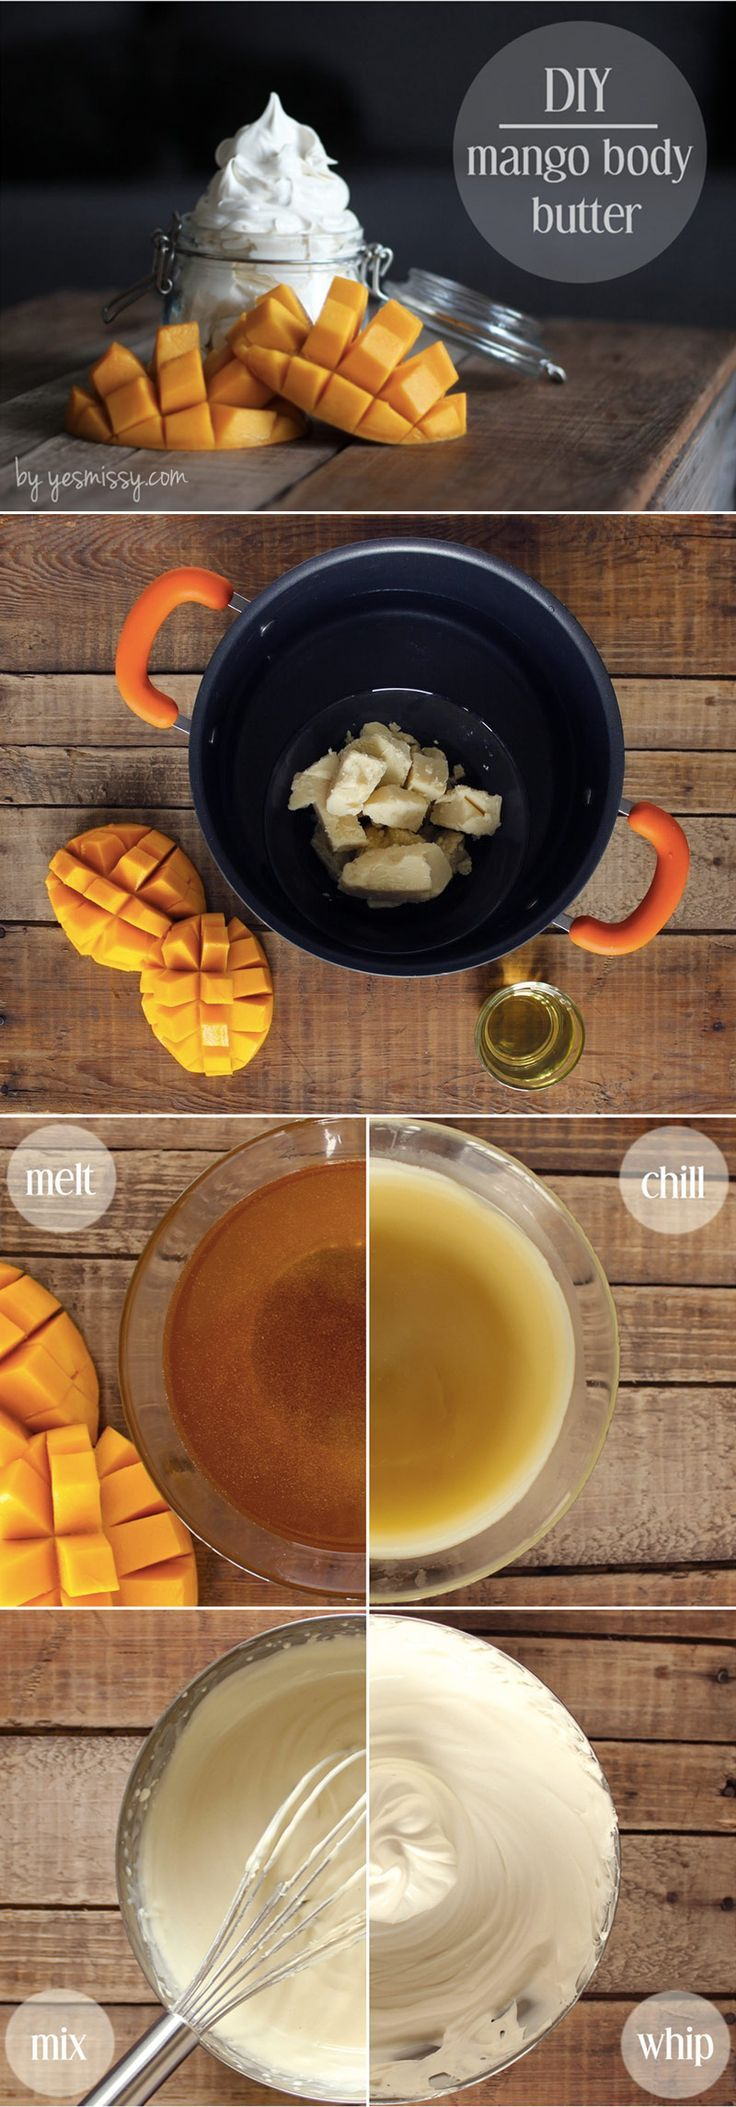 Homemade mango body door decorations … –  Hautpflege-Rezepte